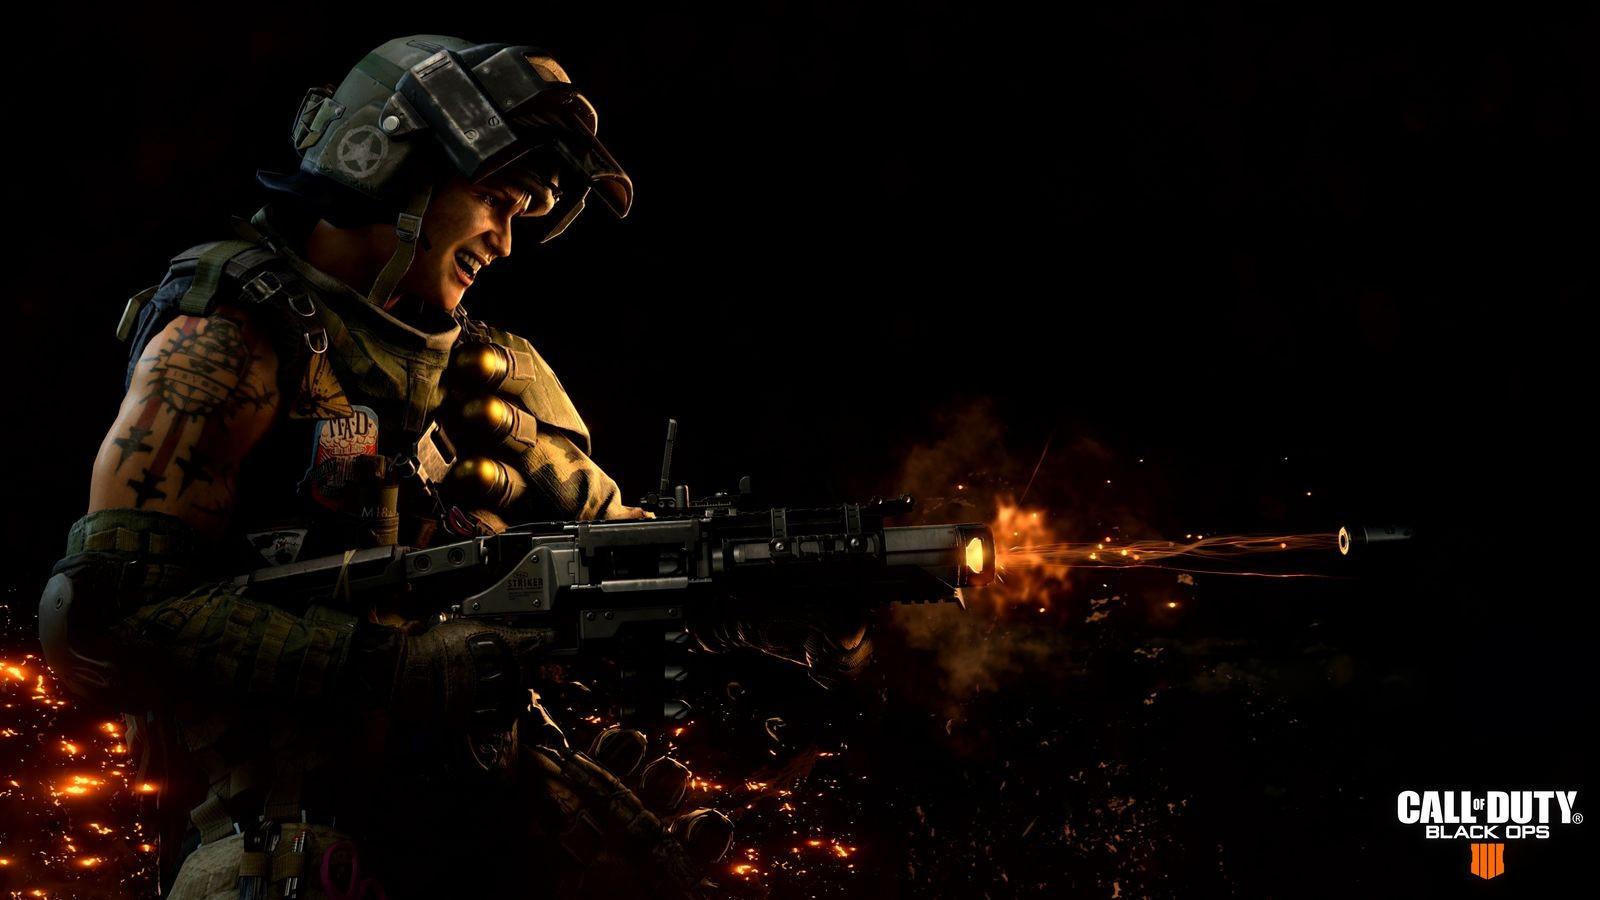 Call of Duty: Black Ops 4 | خرید سی دی کی و نسخه اورجینال بازی - ایران استیم